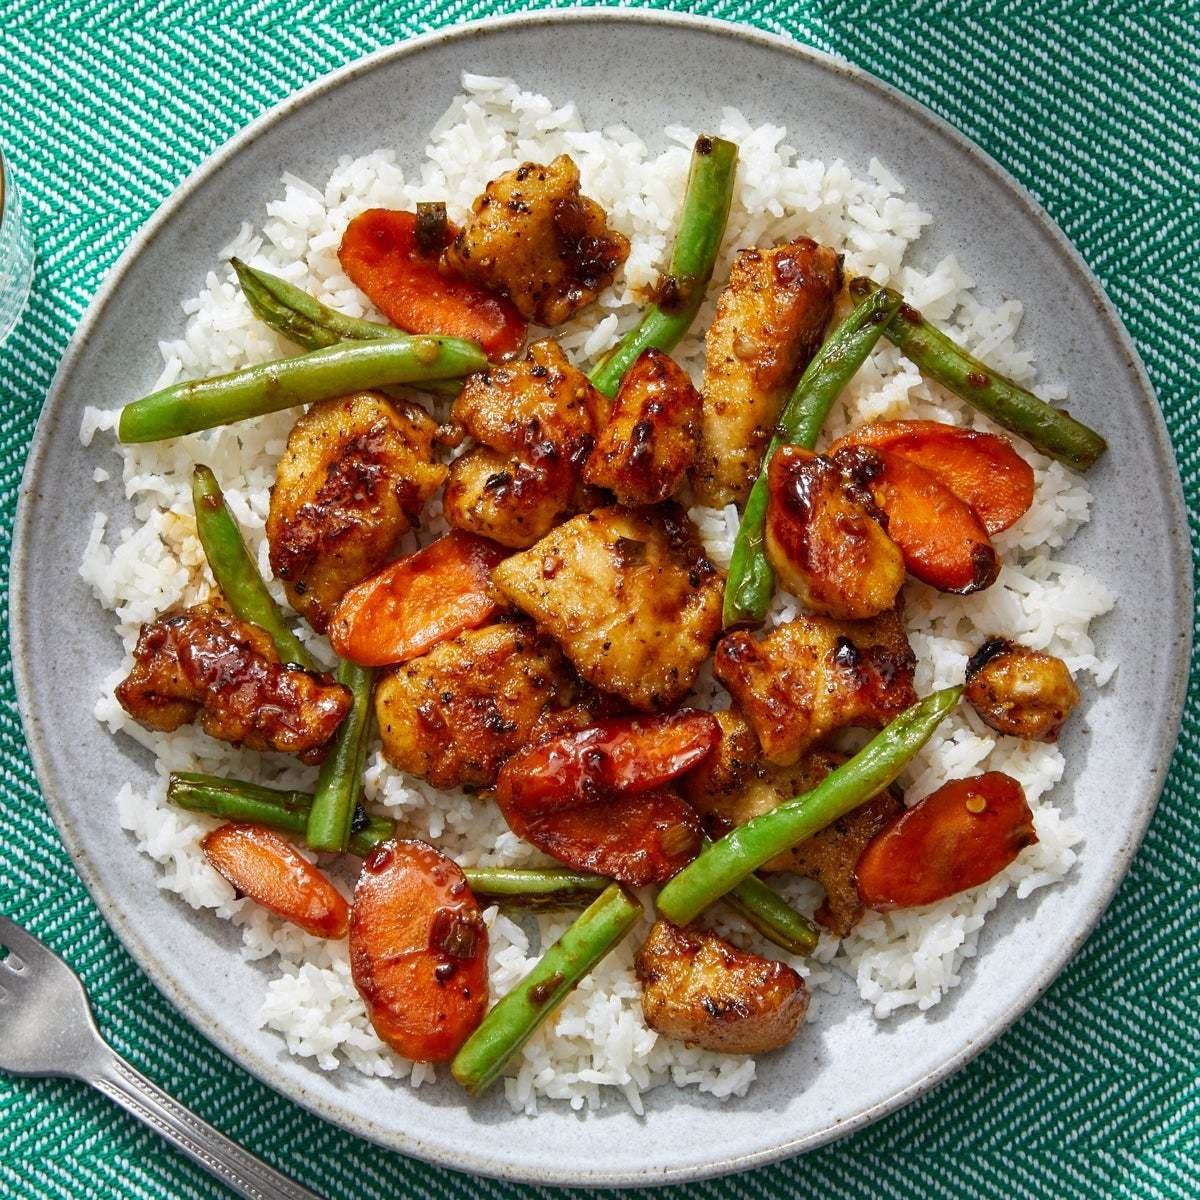 Spicy Sambal Chicken & Rice with Stir-Fried Vegetables